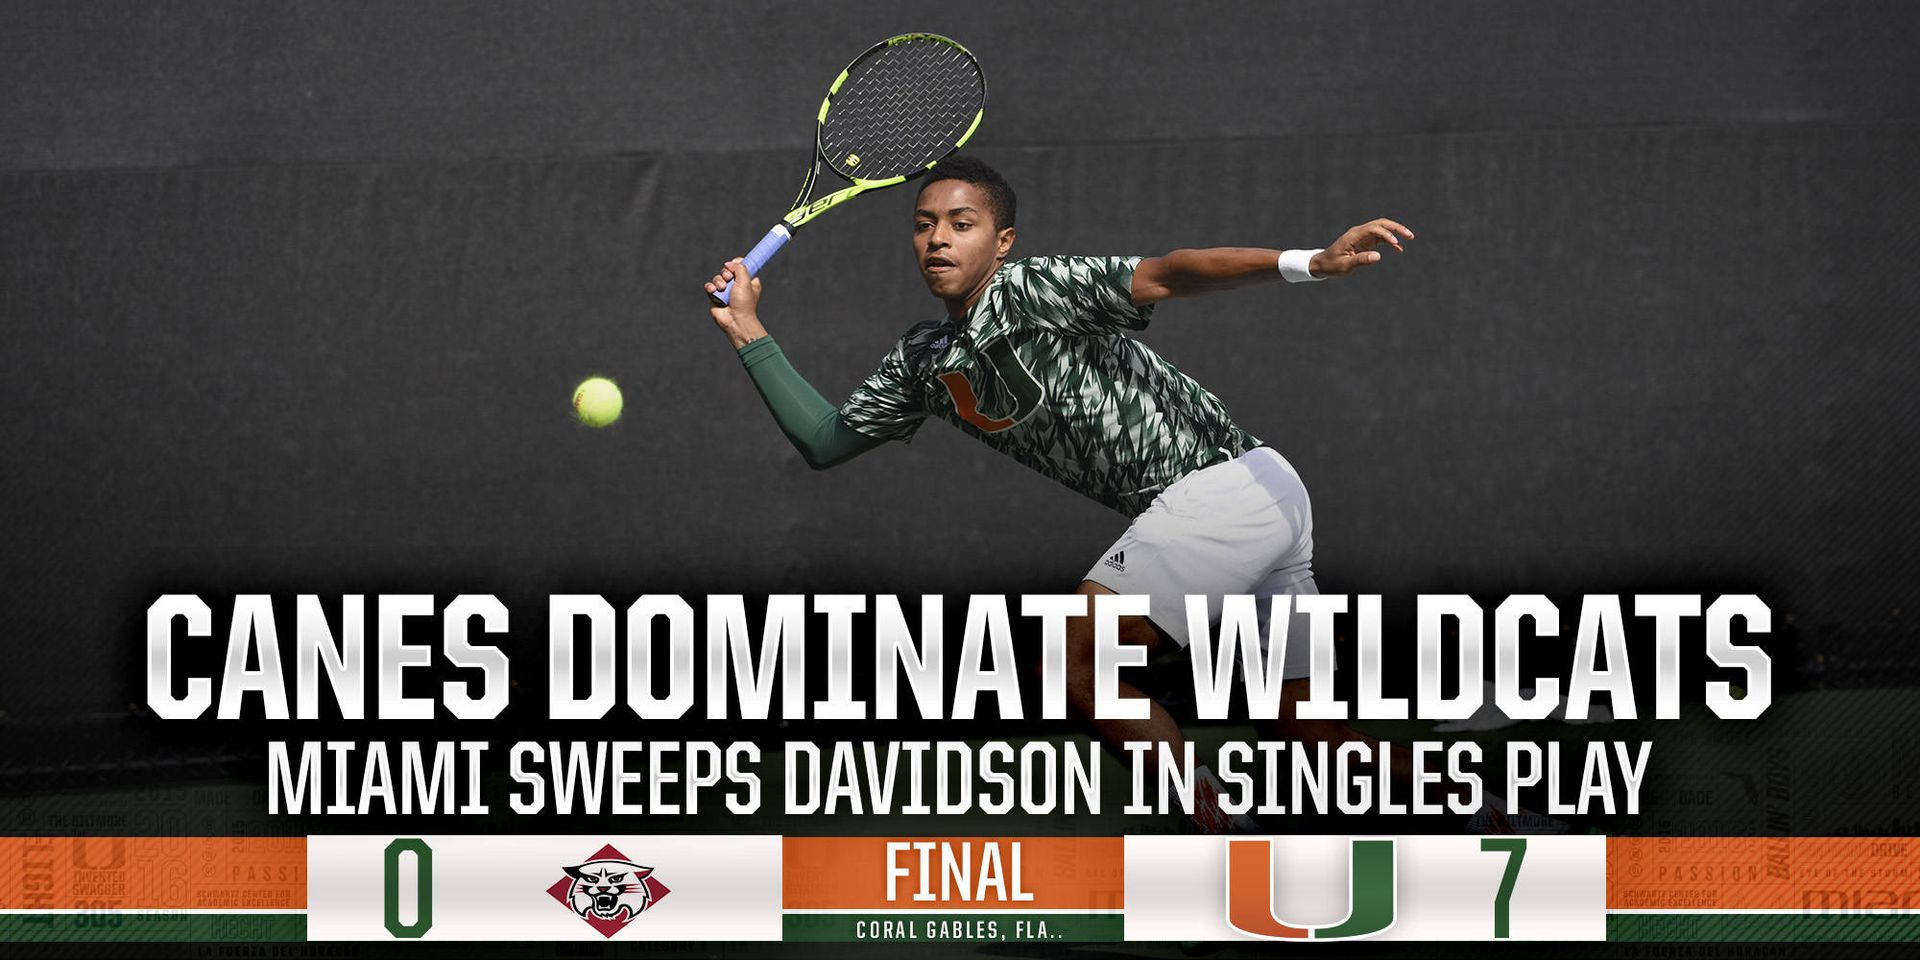 Miami Takes Down Davidson, 7-0